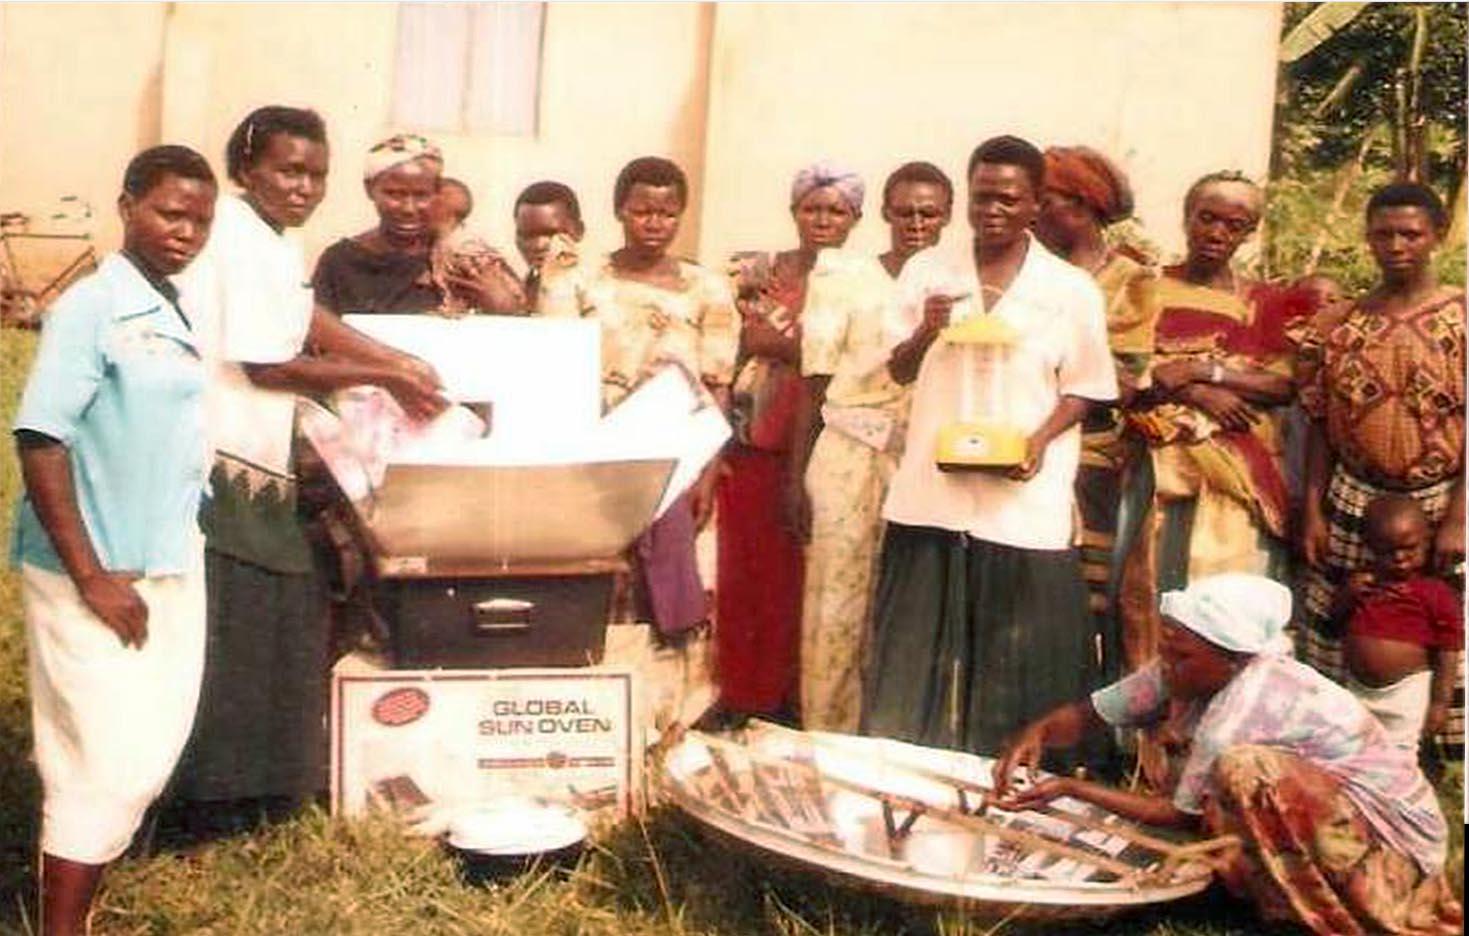 Welfare Society for Solar Development